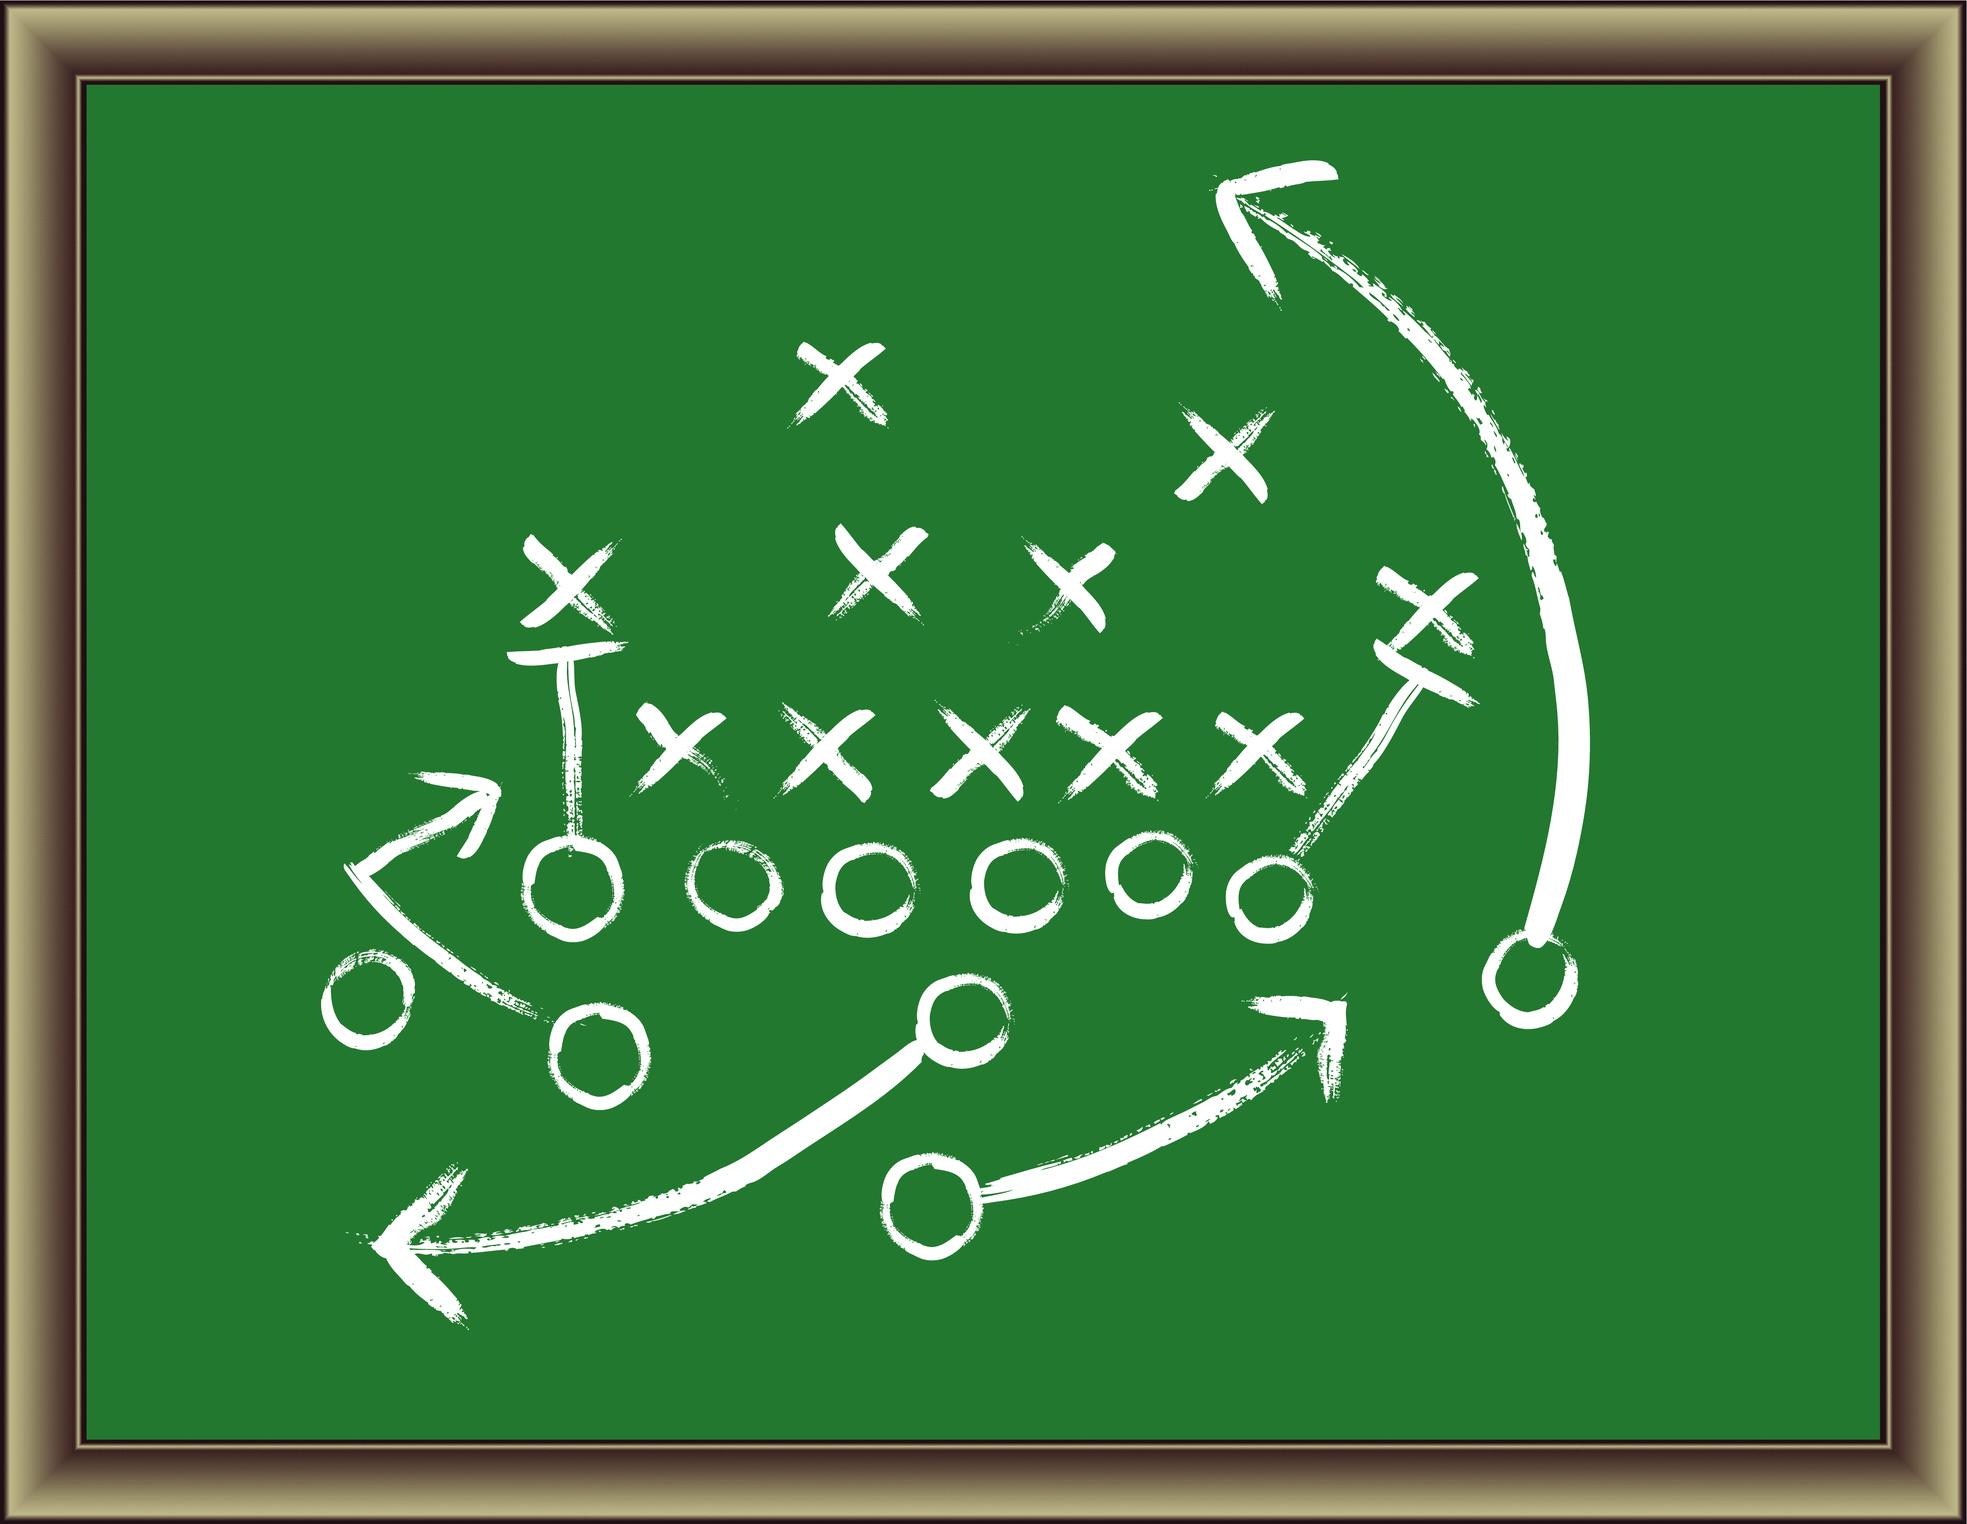 Football play diagrammed on a green chalkboard